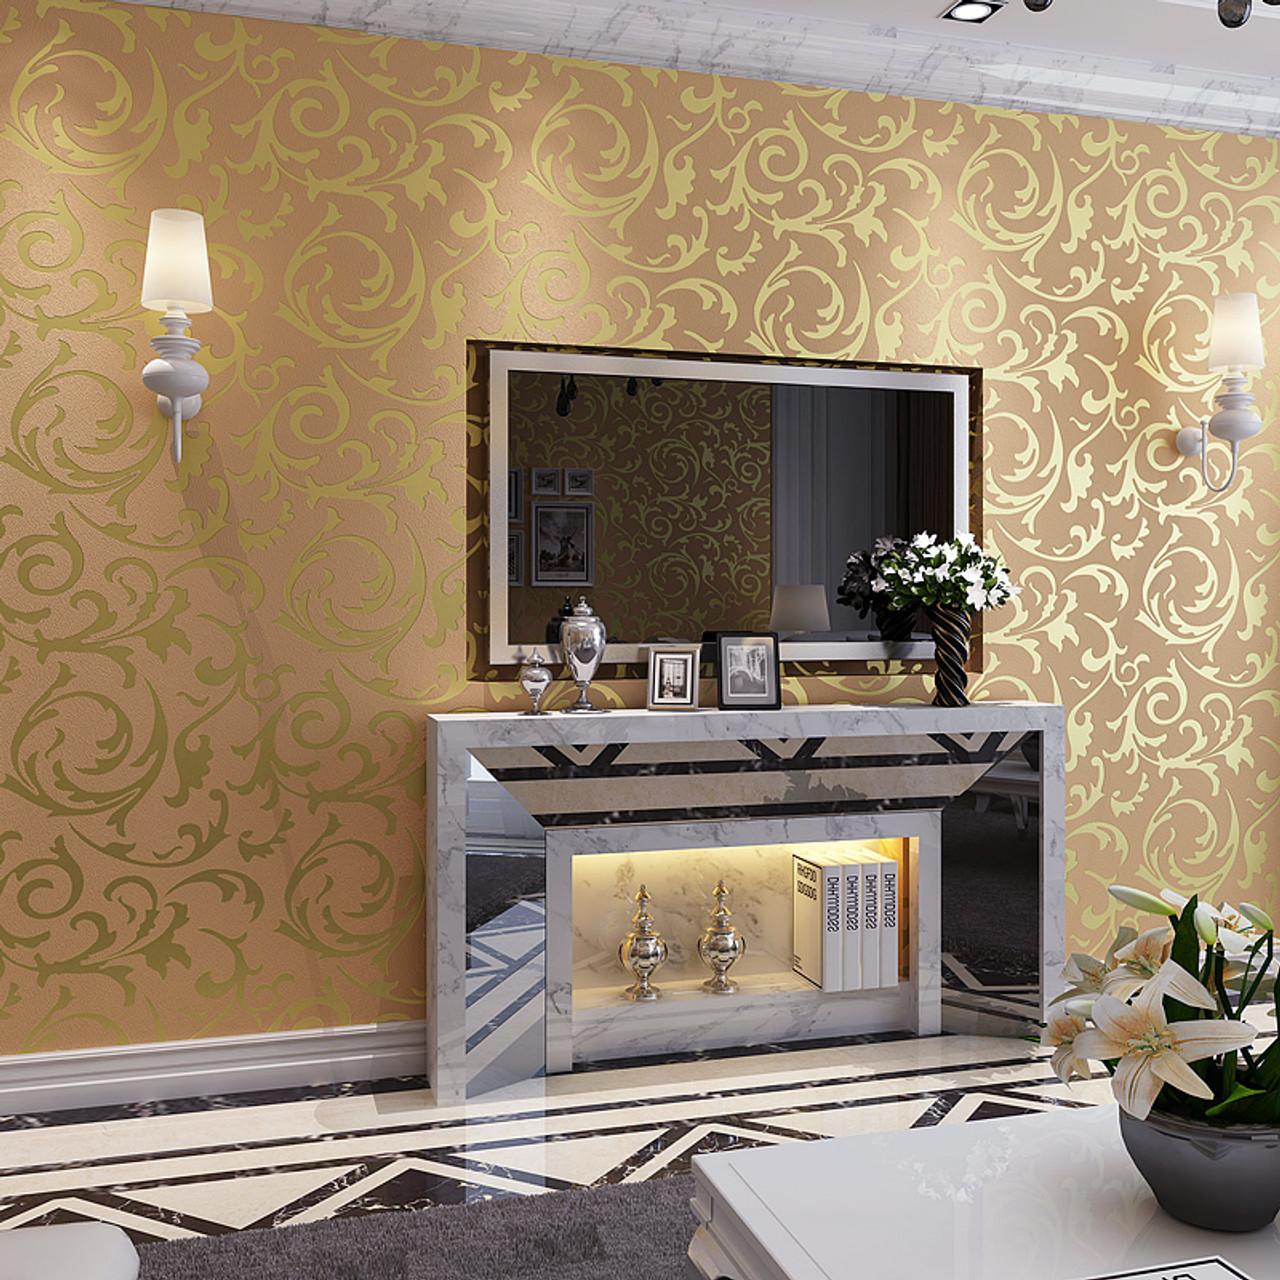 Gold Wallpapers 3d Wall Murals European Non Woven Wall Paper Flower Bedroom Wallpaper For Wallsgrey Papel De Parede Para Quarto